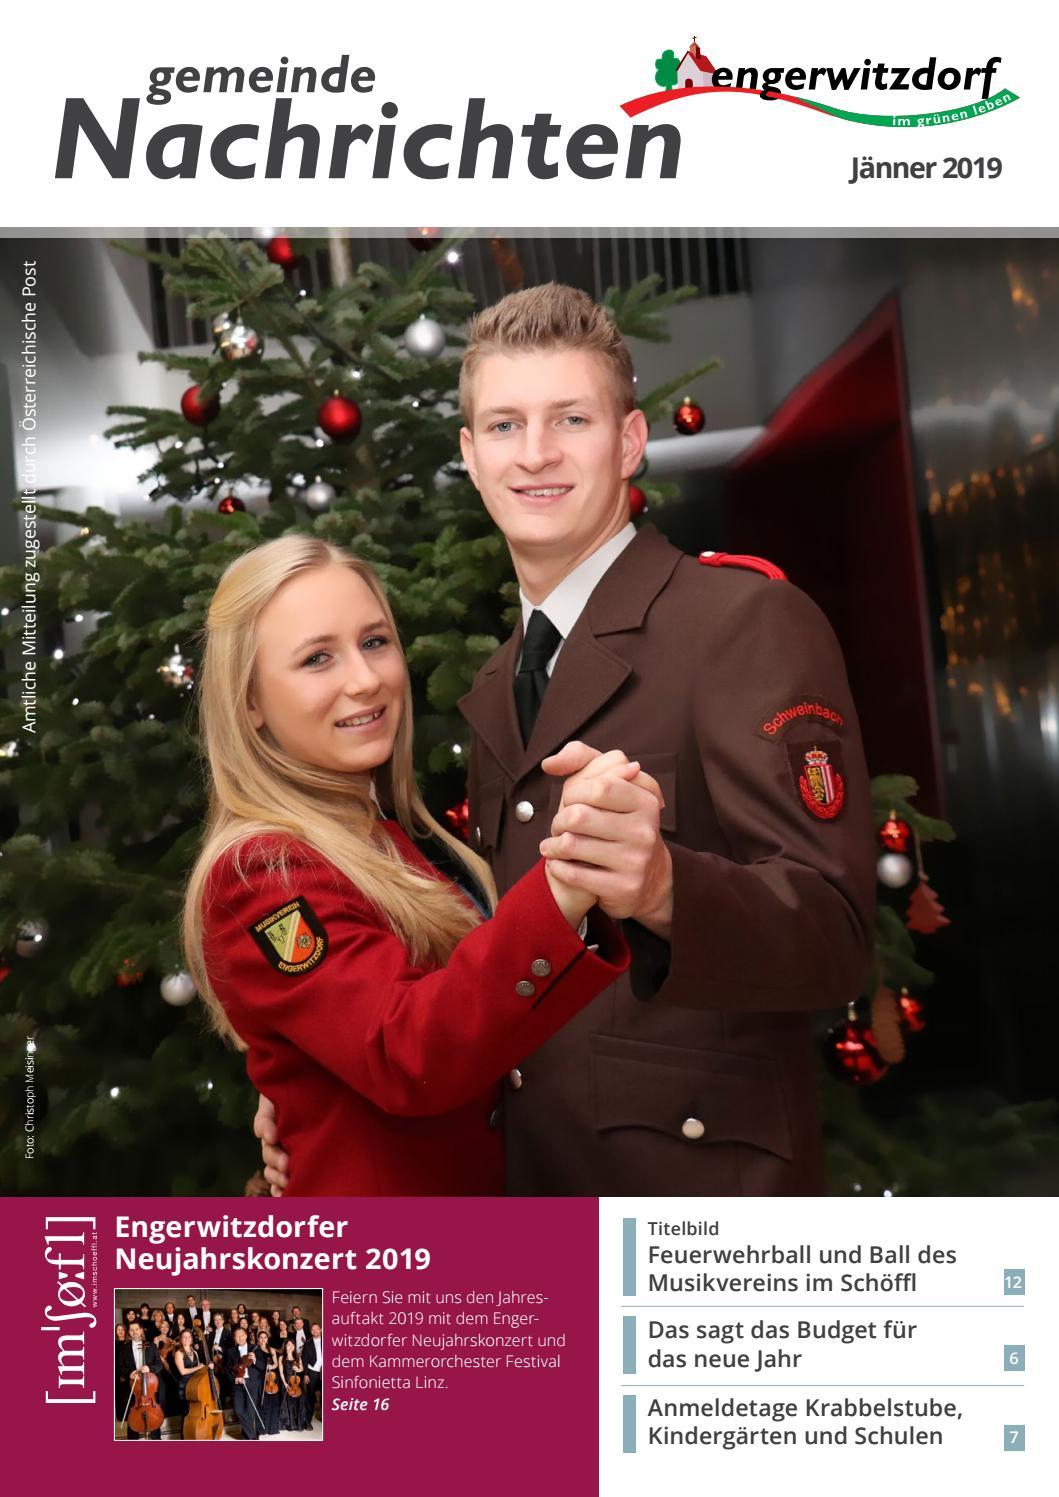 Studenten Dating Aus Absdorf Nette Leute Kennenlernen